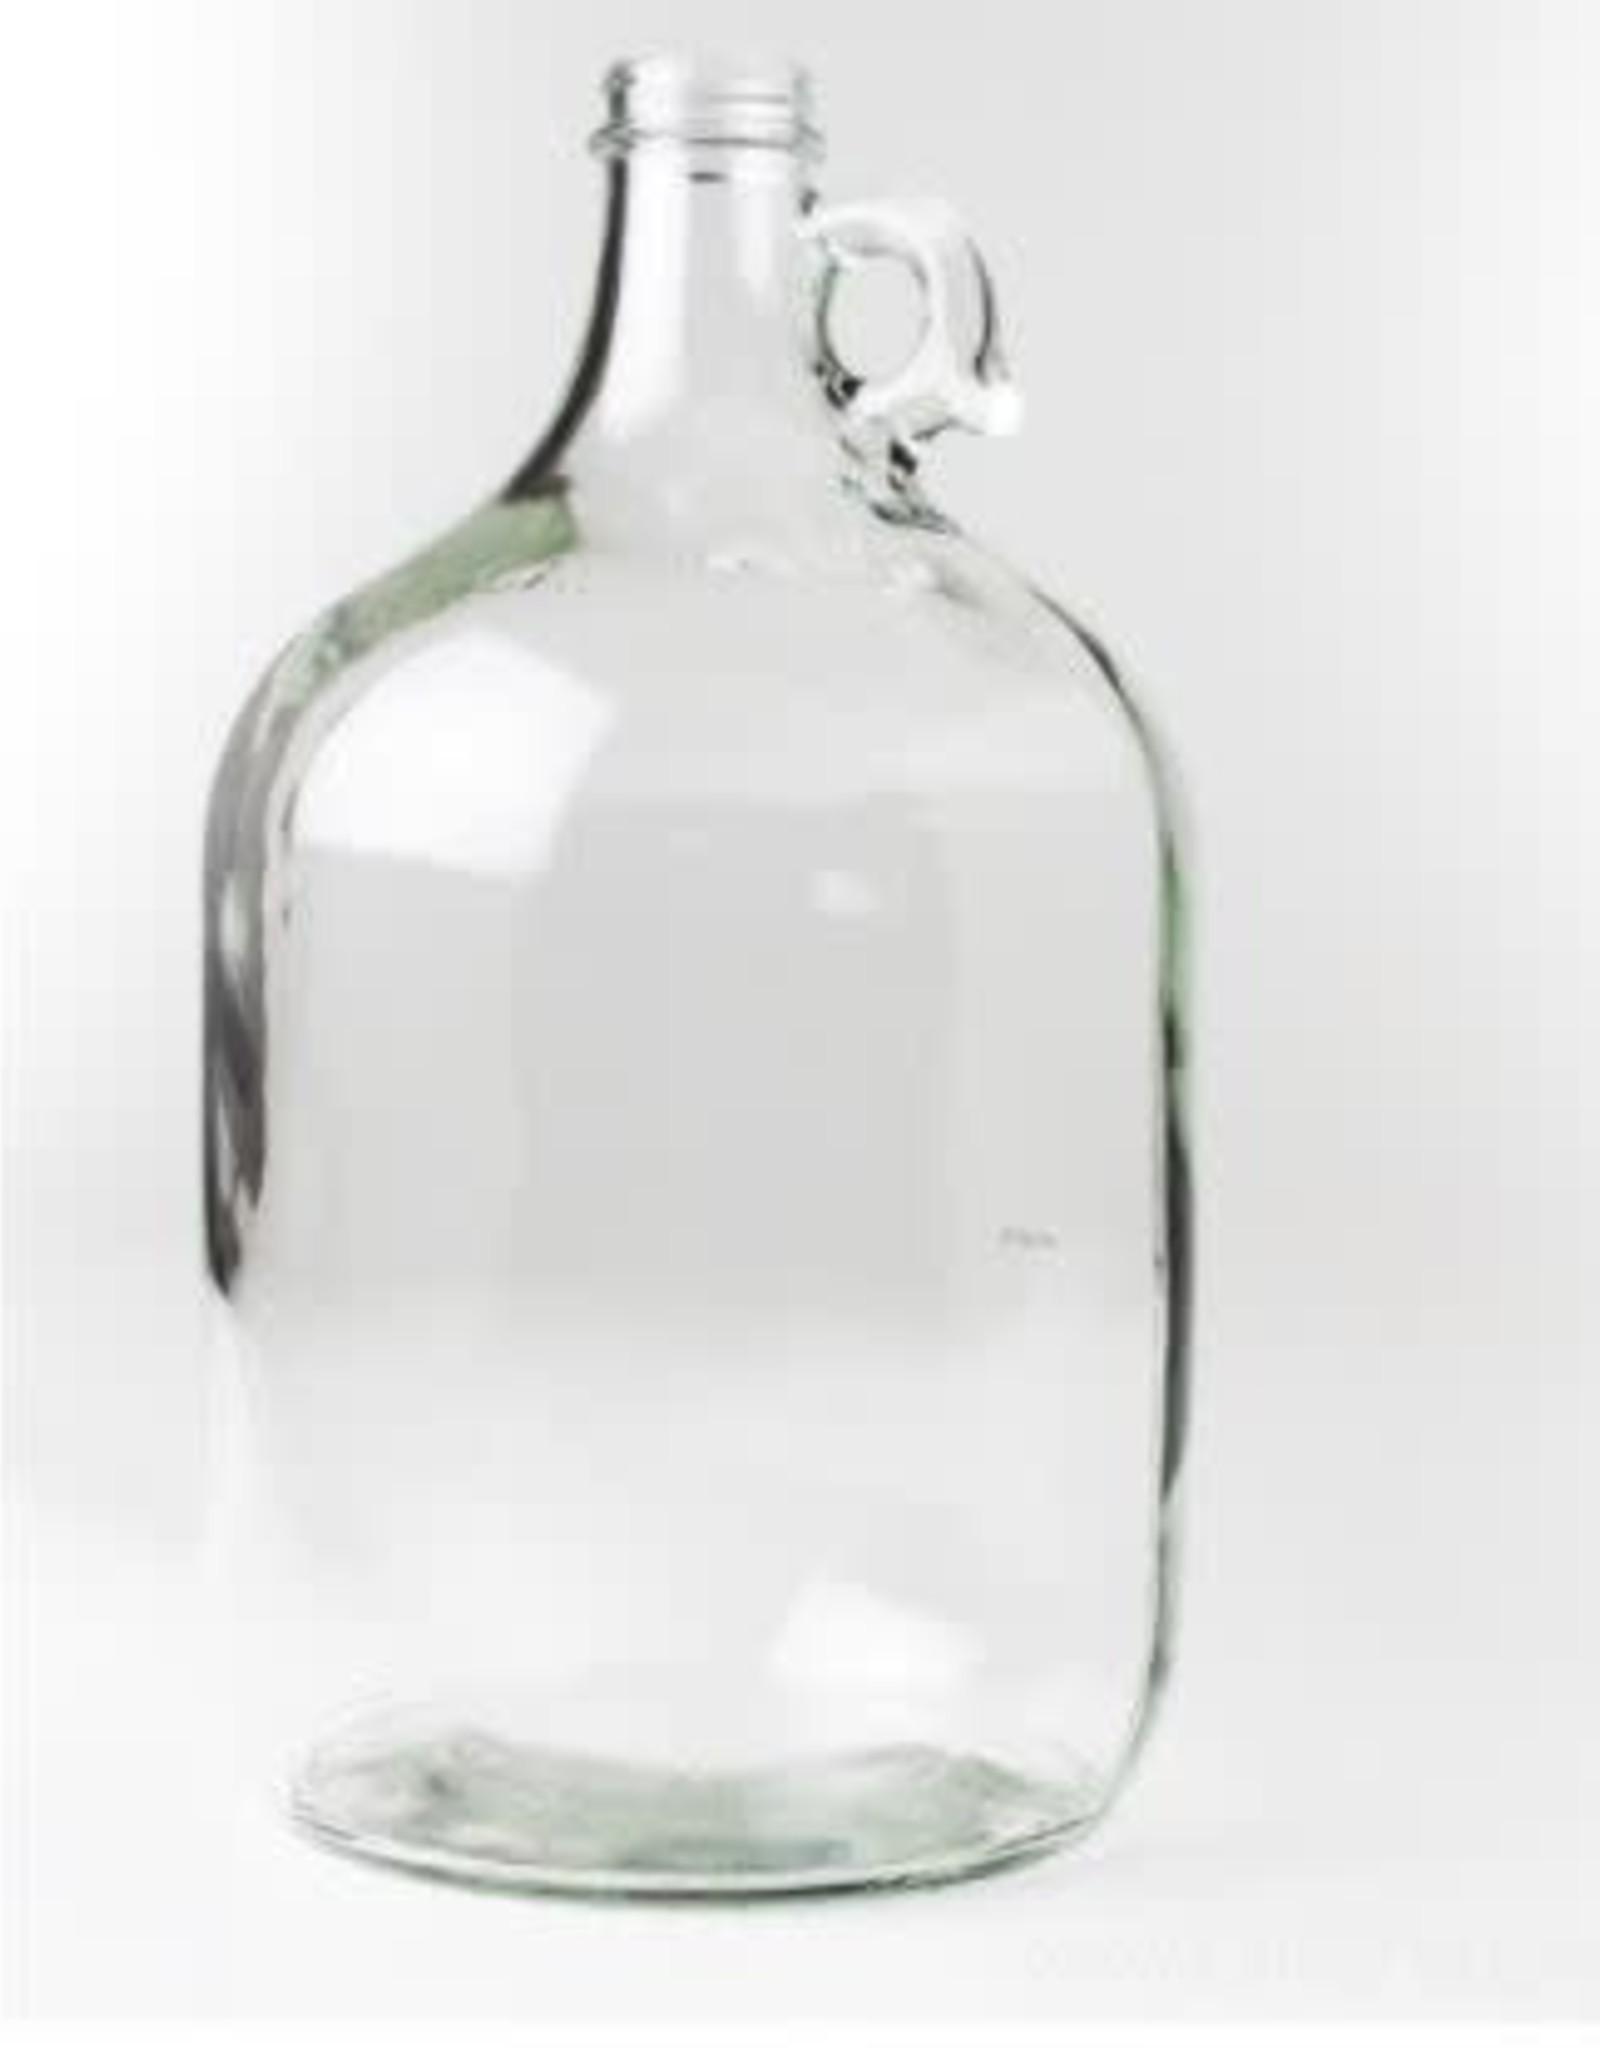 1 GALLON GLASS JUG